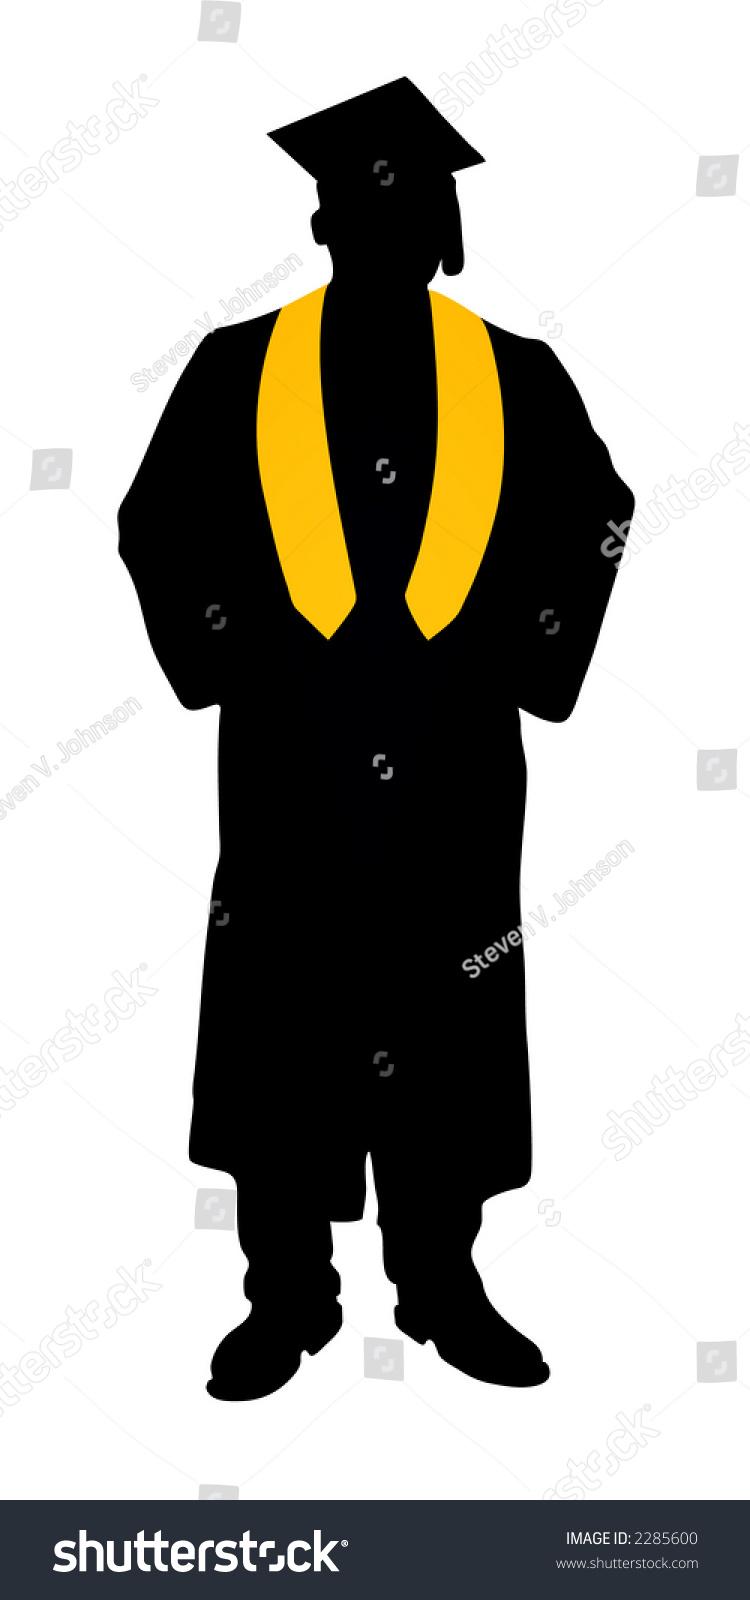 Graduate Silhouette Stock Vector 2285600 Shutterstock